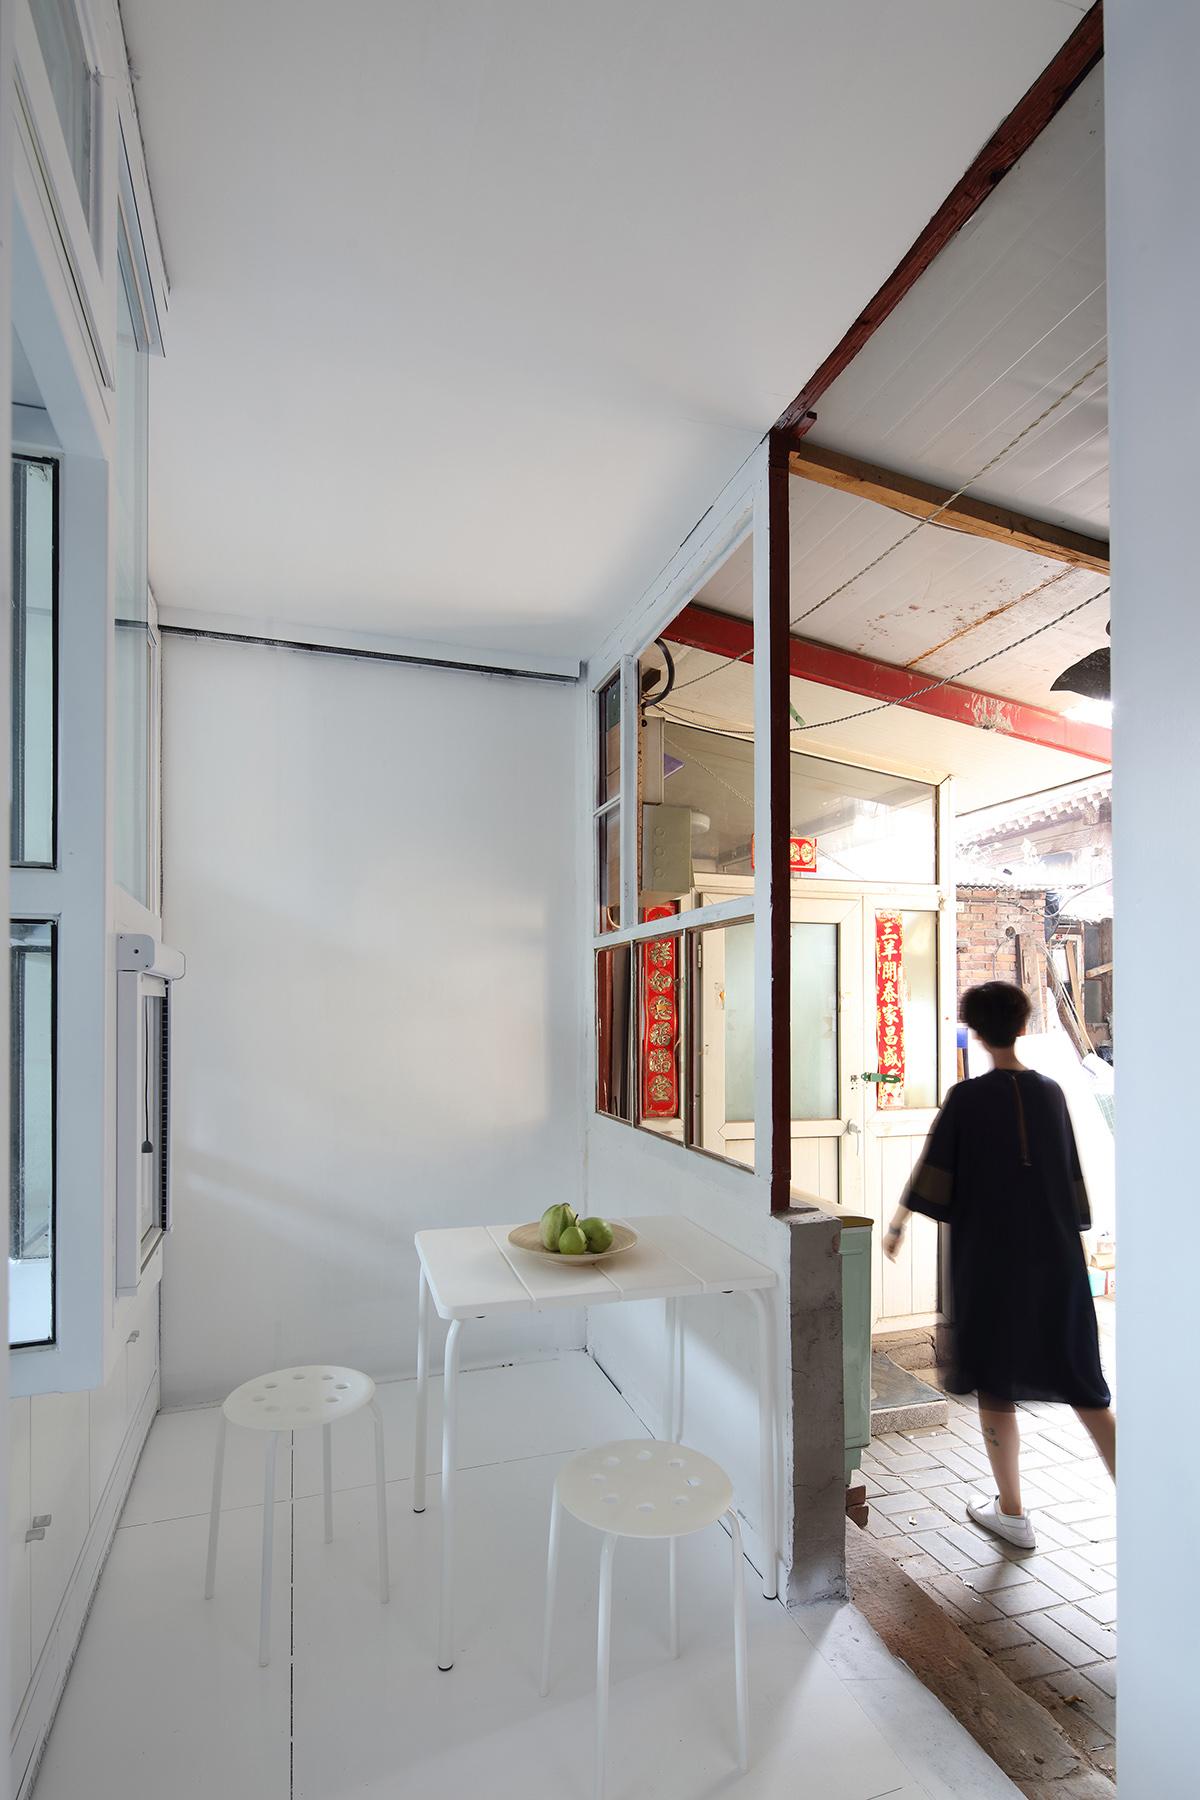 Caopu-humble-hostel-hisheji (12)